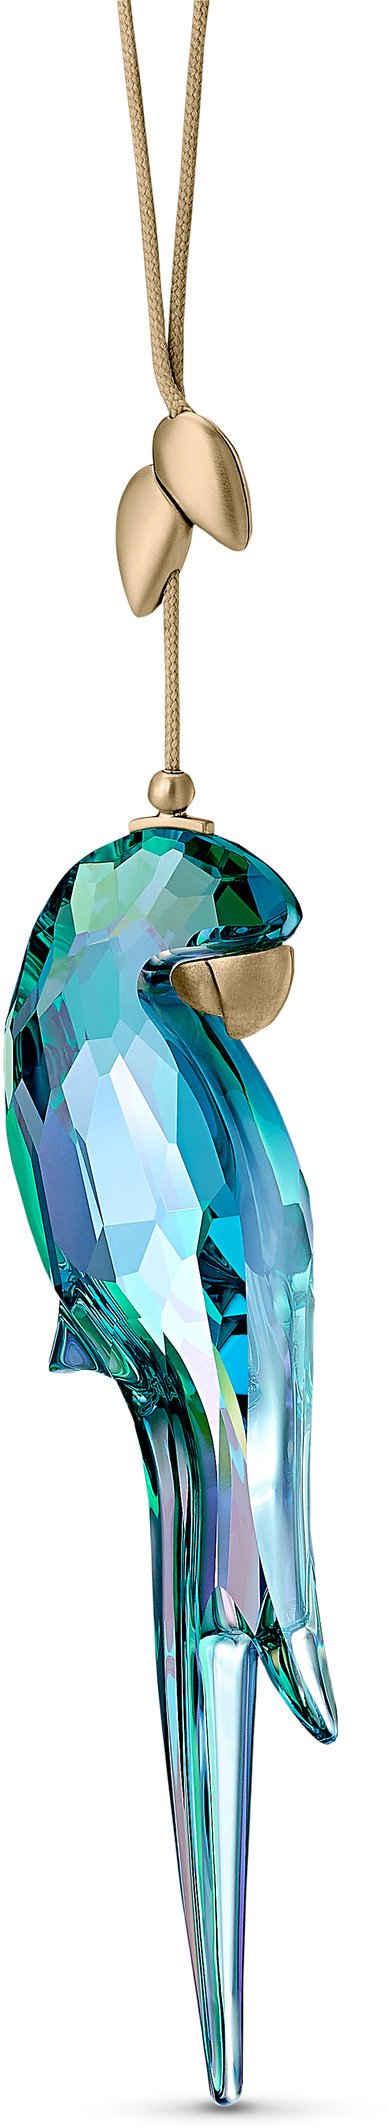 Swarovski Dekoobjekt »Jungle Beats Papagei Ornament, 5572151« (1 Stück), Swarovski® Kristall